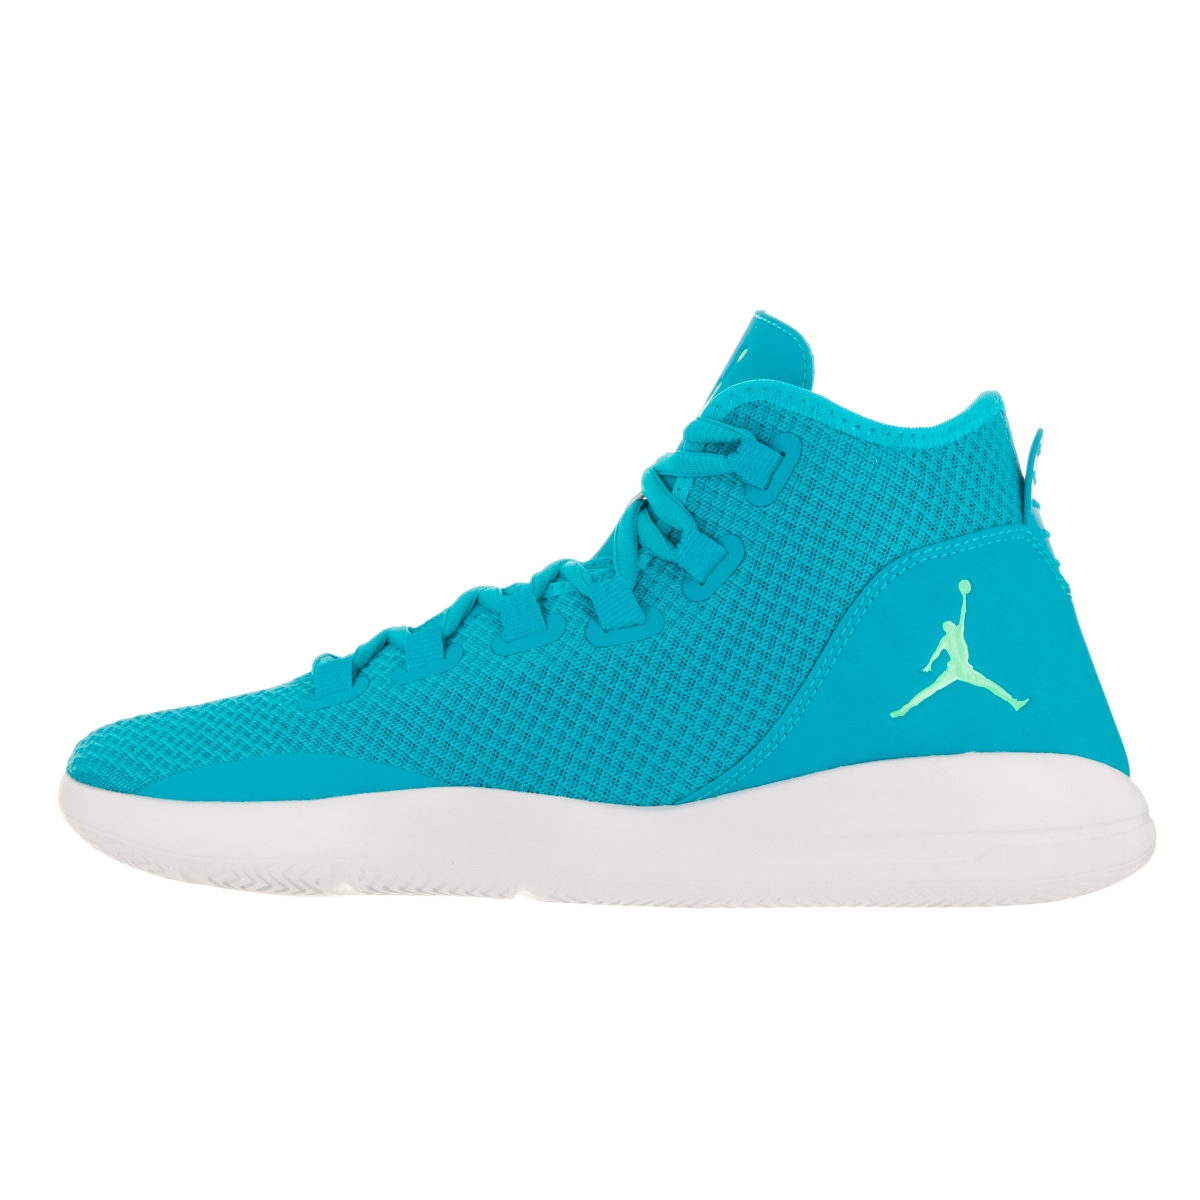 07a695738fd8d1 Shop Nike Men s Jordan Reveal Blue Basketball Shoe - Free Shipping Today -  Overstock - 13984360